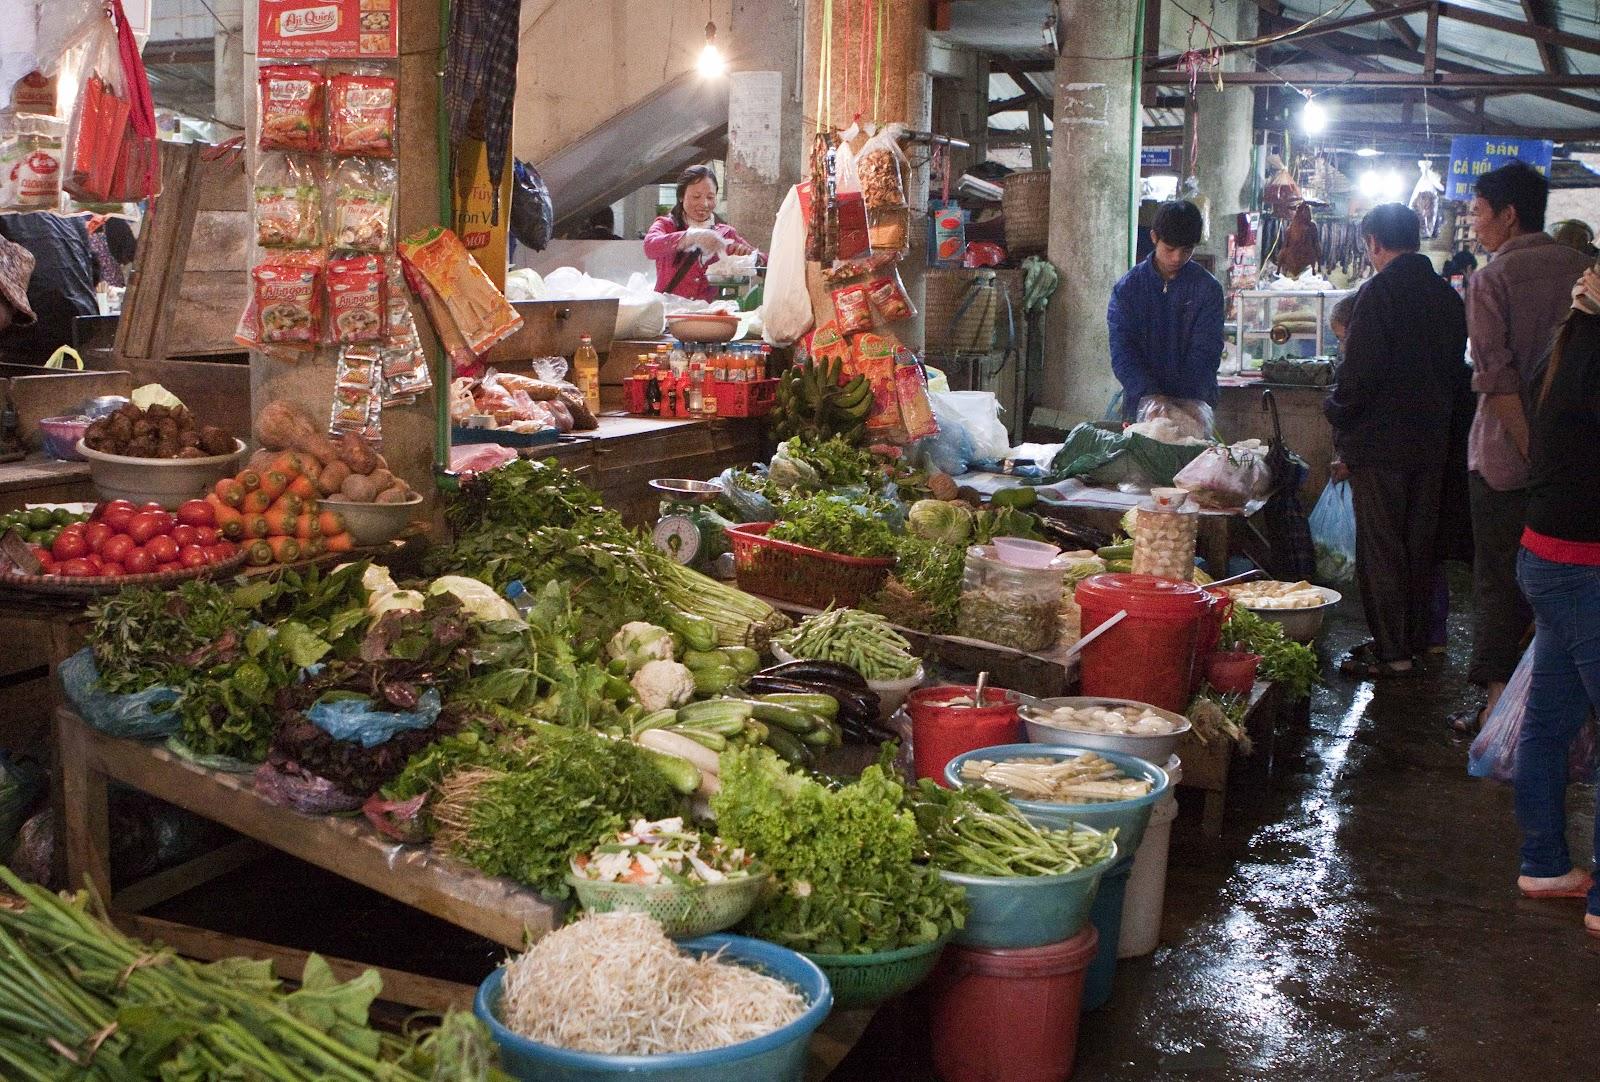 Лоток с овощами на вьетнамском рынке.